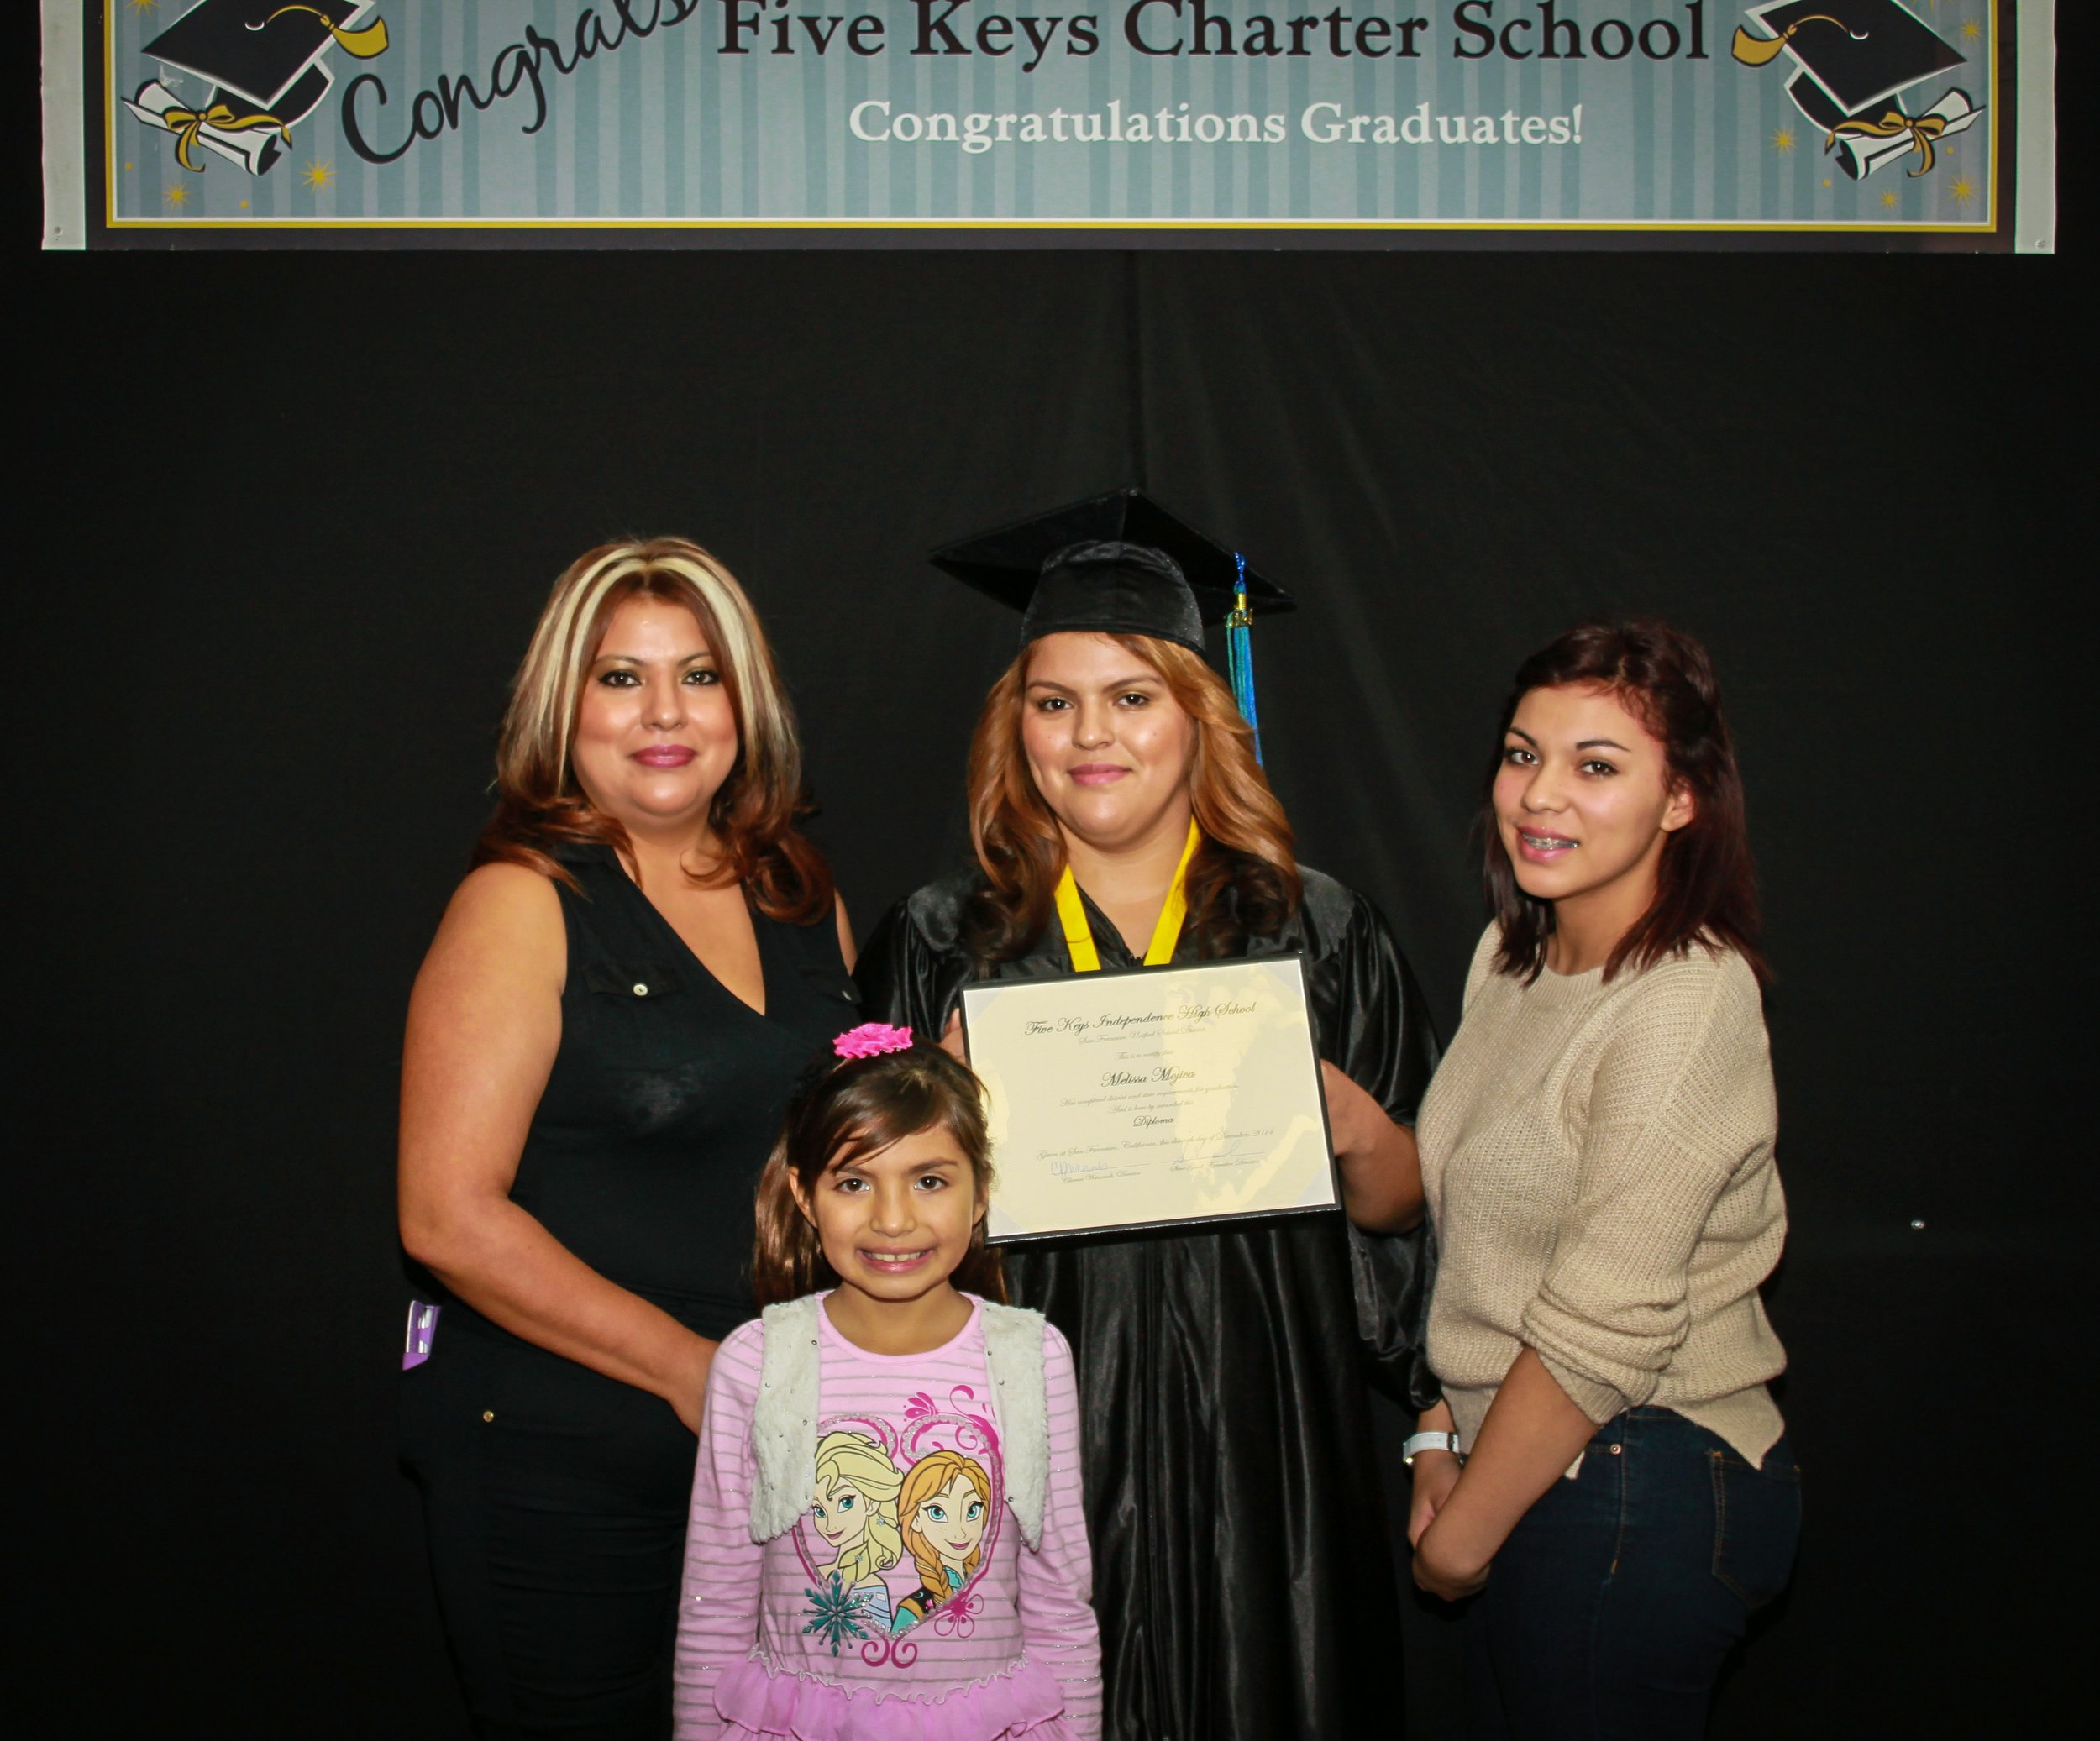 Graduate and family (7).jpg